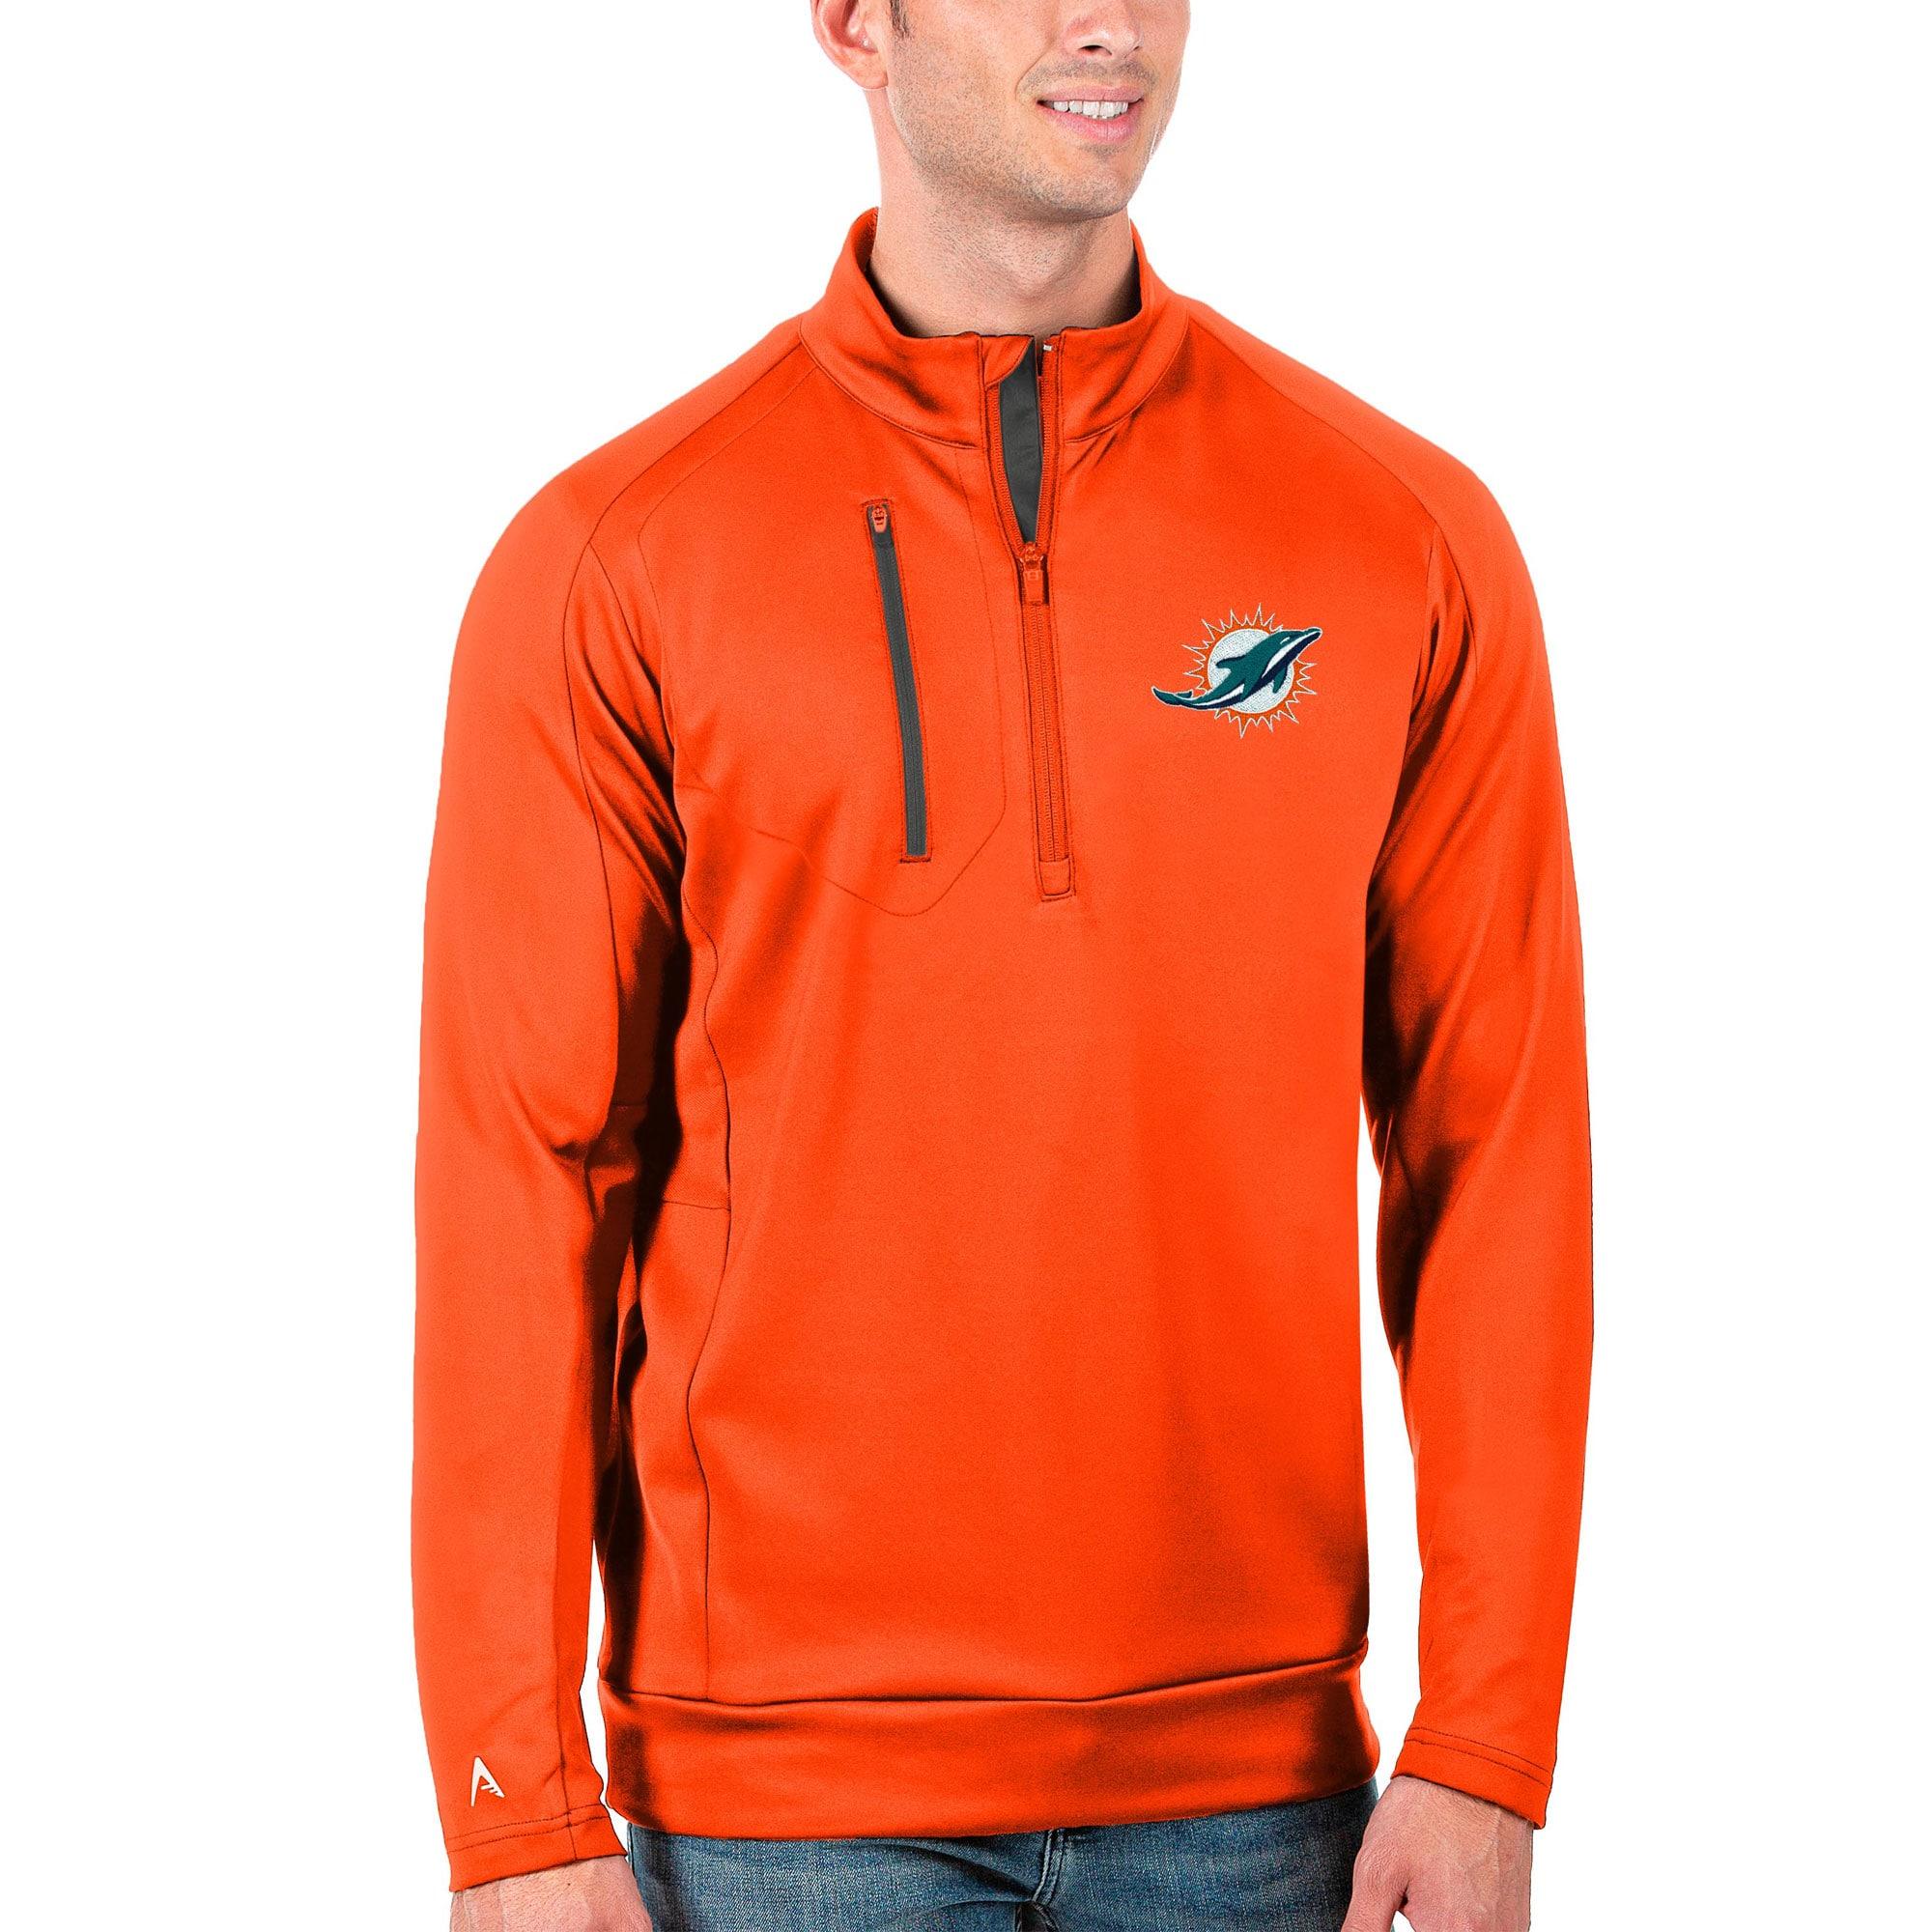 Miami Dolphins Antigua Generation Quarter-Zip Pullover Jacket - Orange/Charcoal